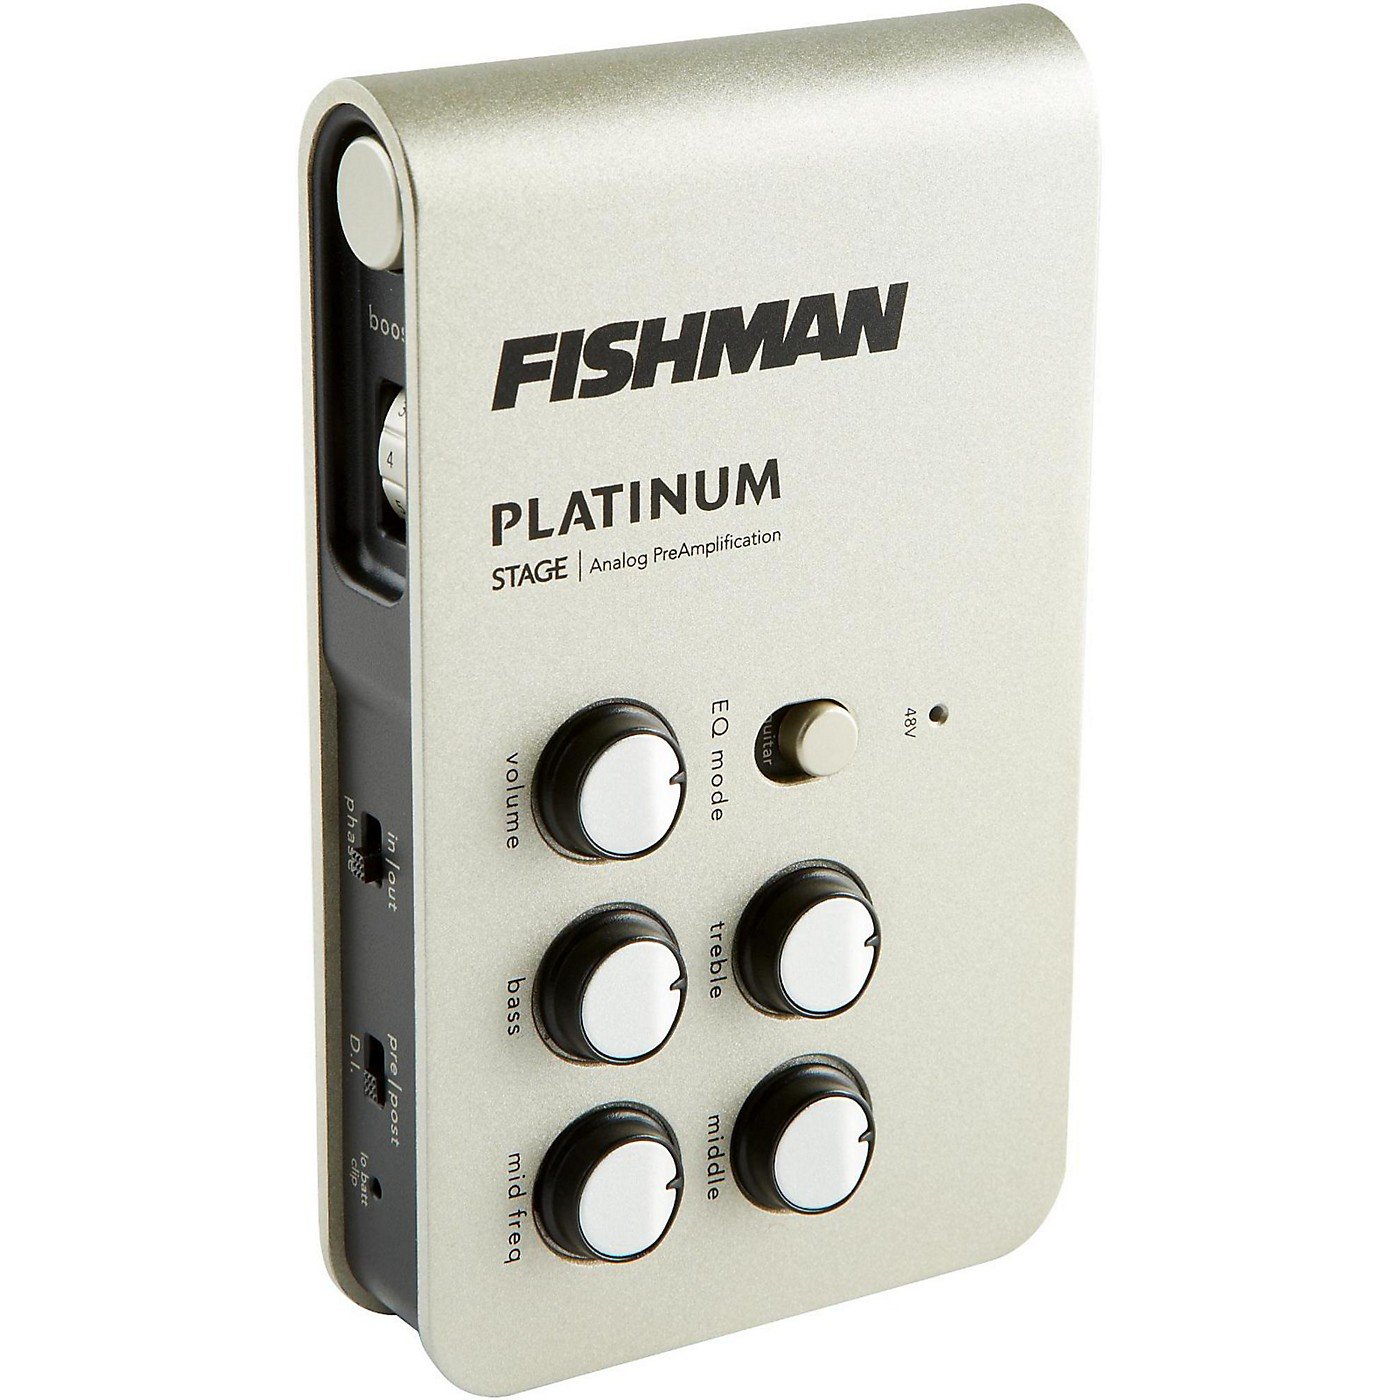 Fishman Platinum Stage Acoustic Guitar Preamp thumbnail